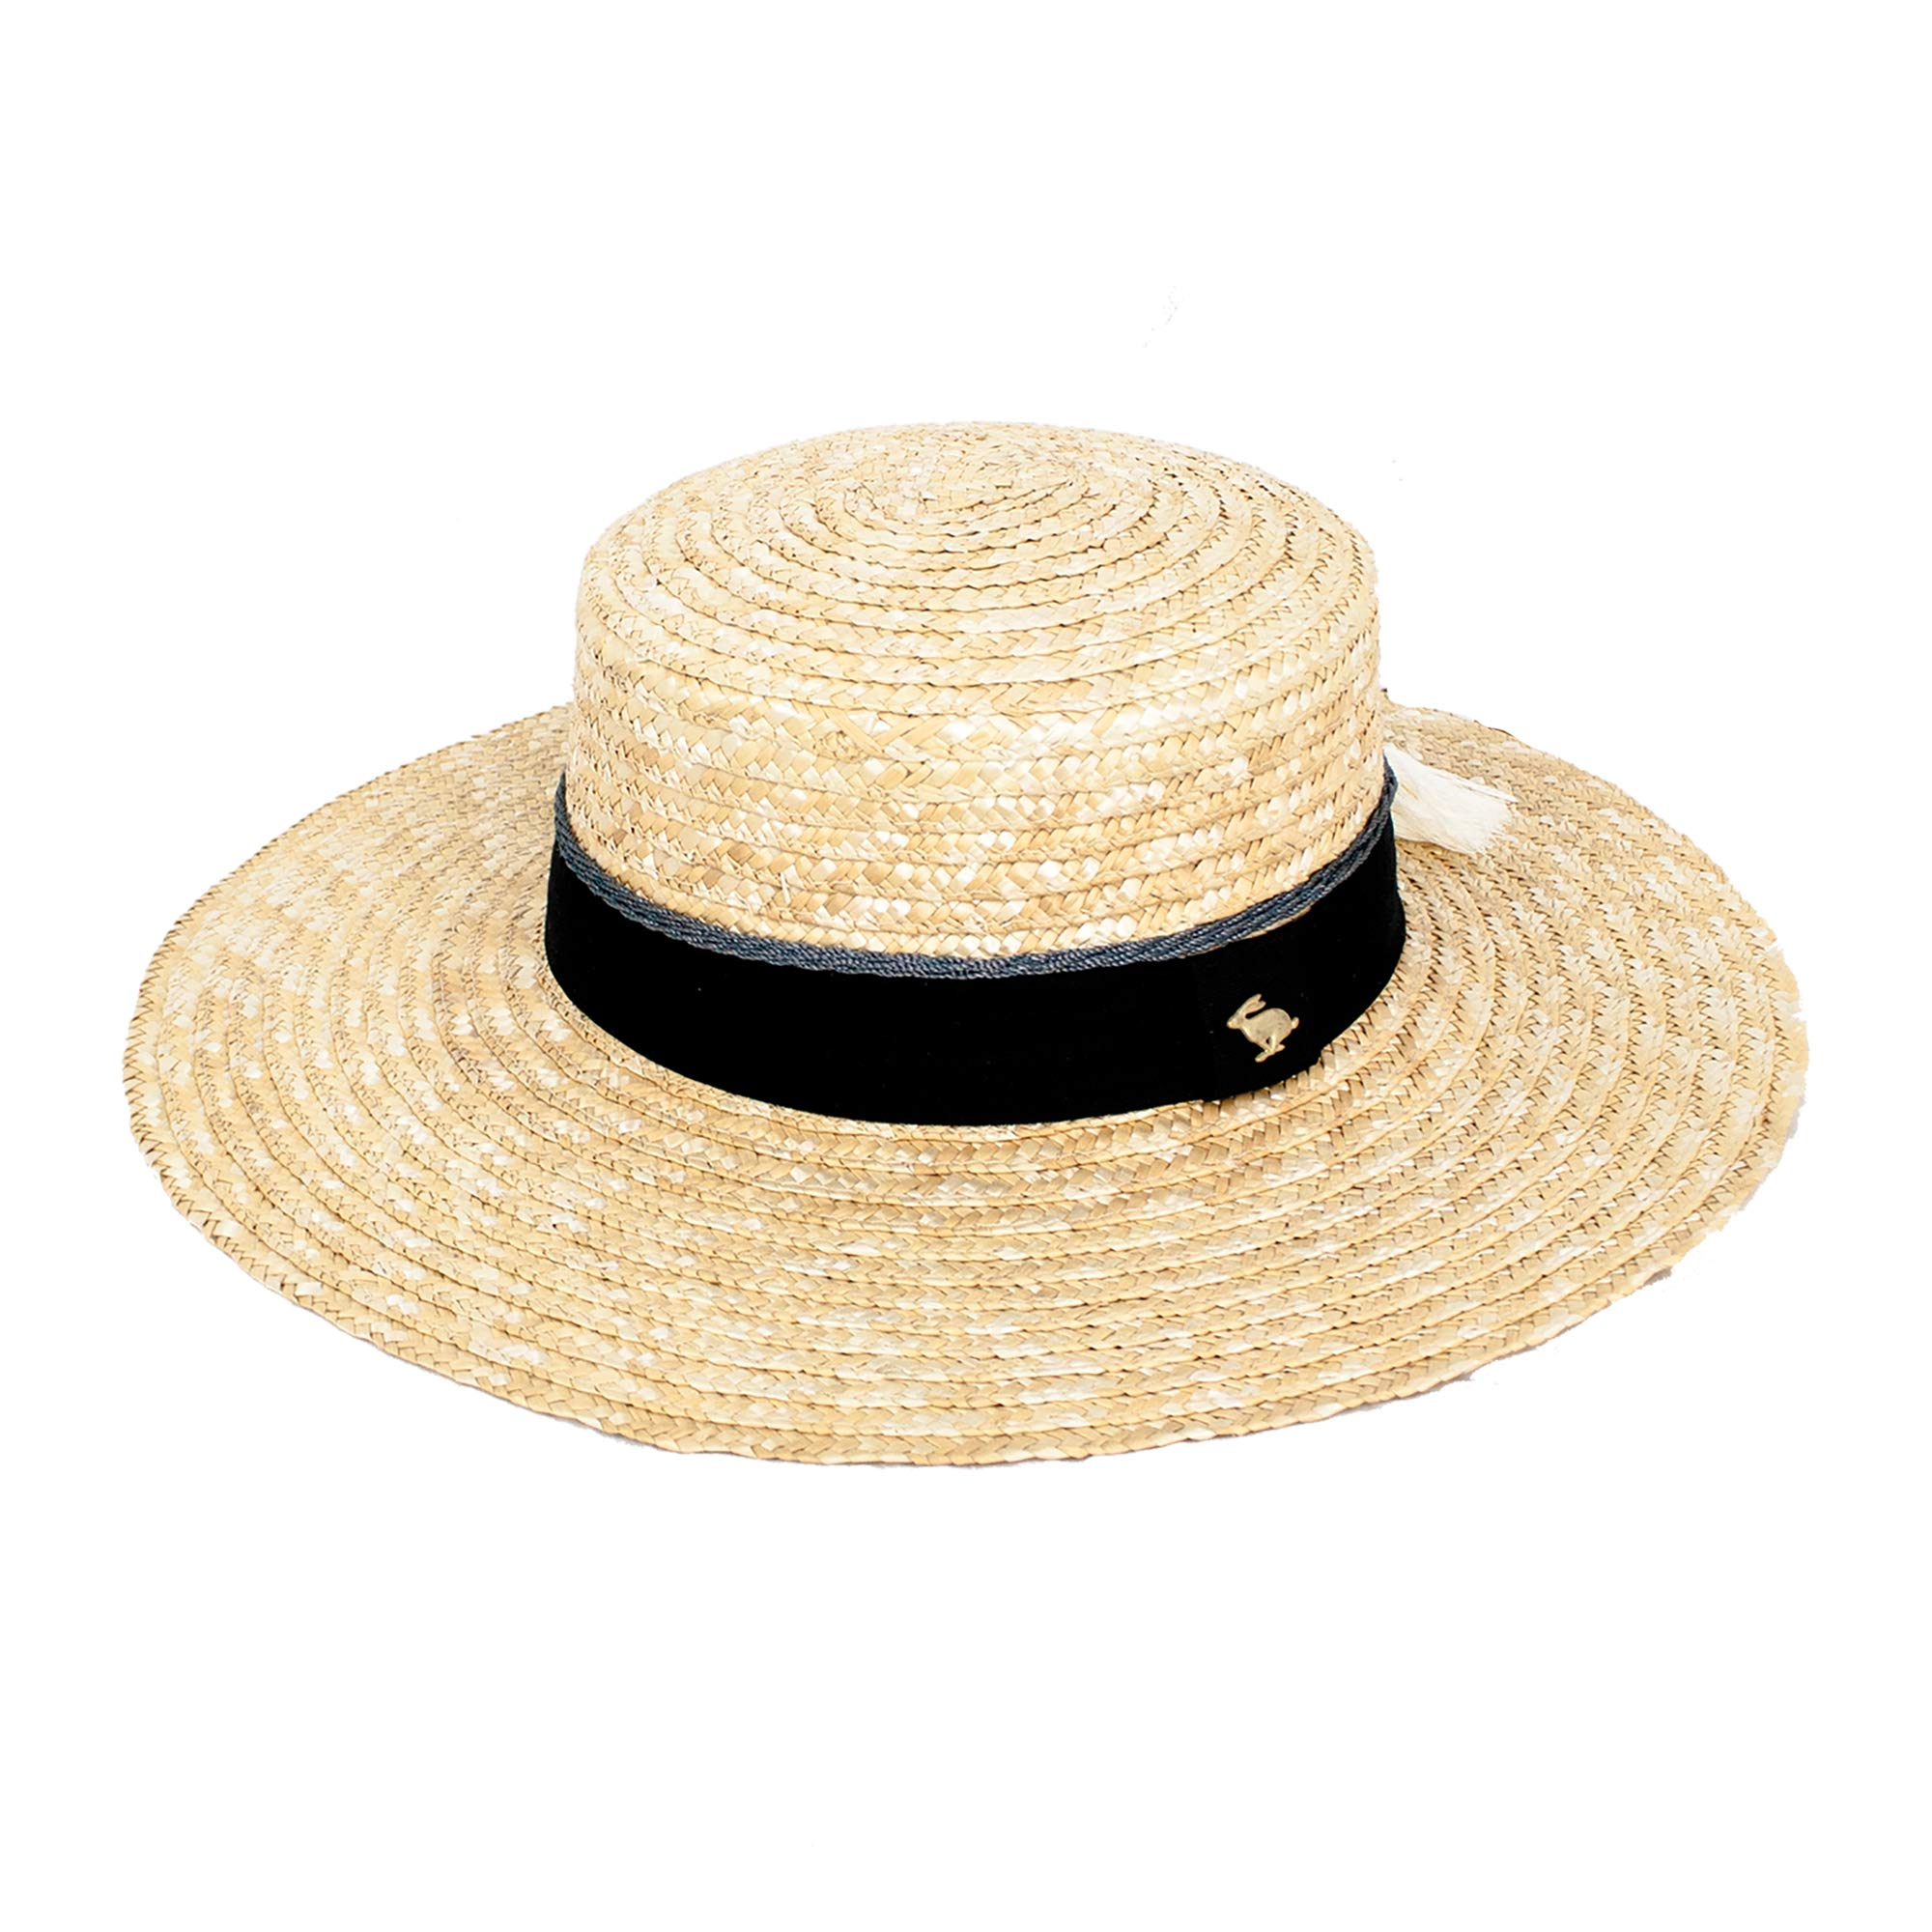 Peter Grimm Teresa Resort Hat